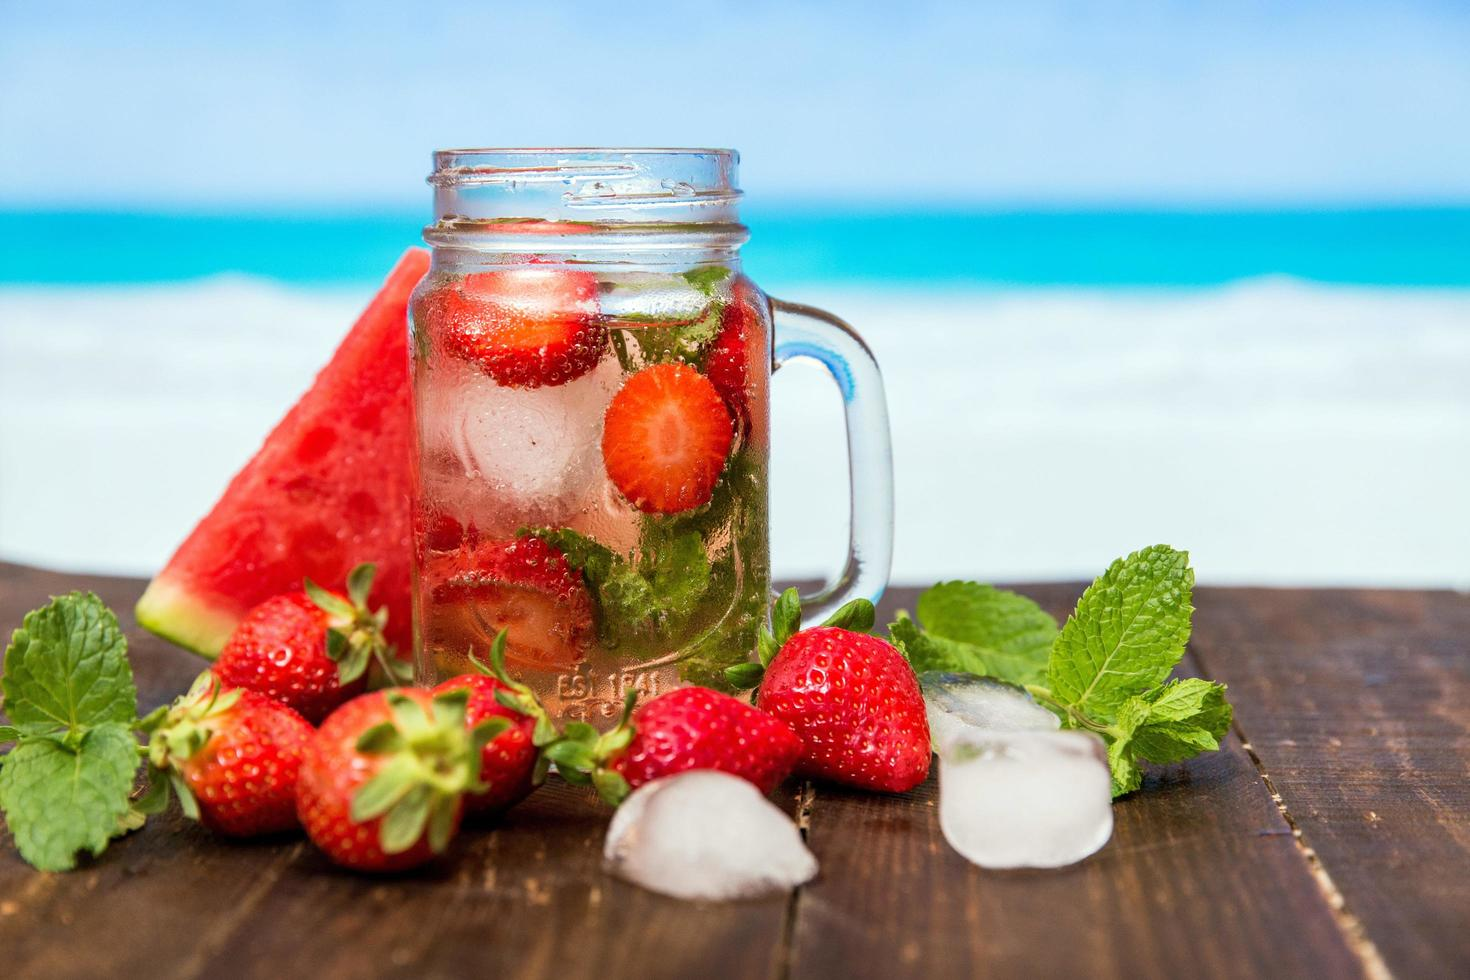 bevanda alla fragola su sfondo tropicale foto